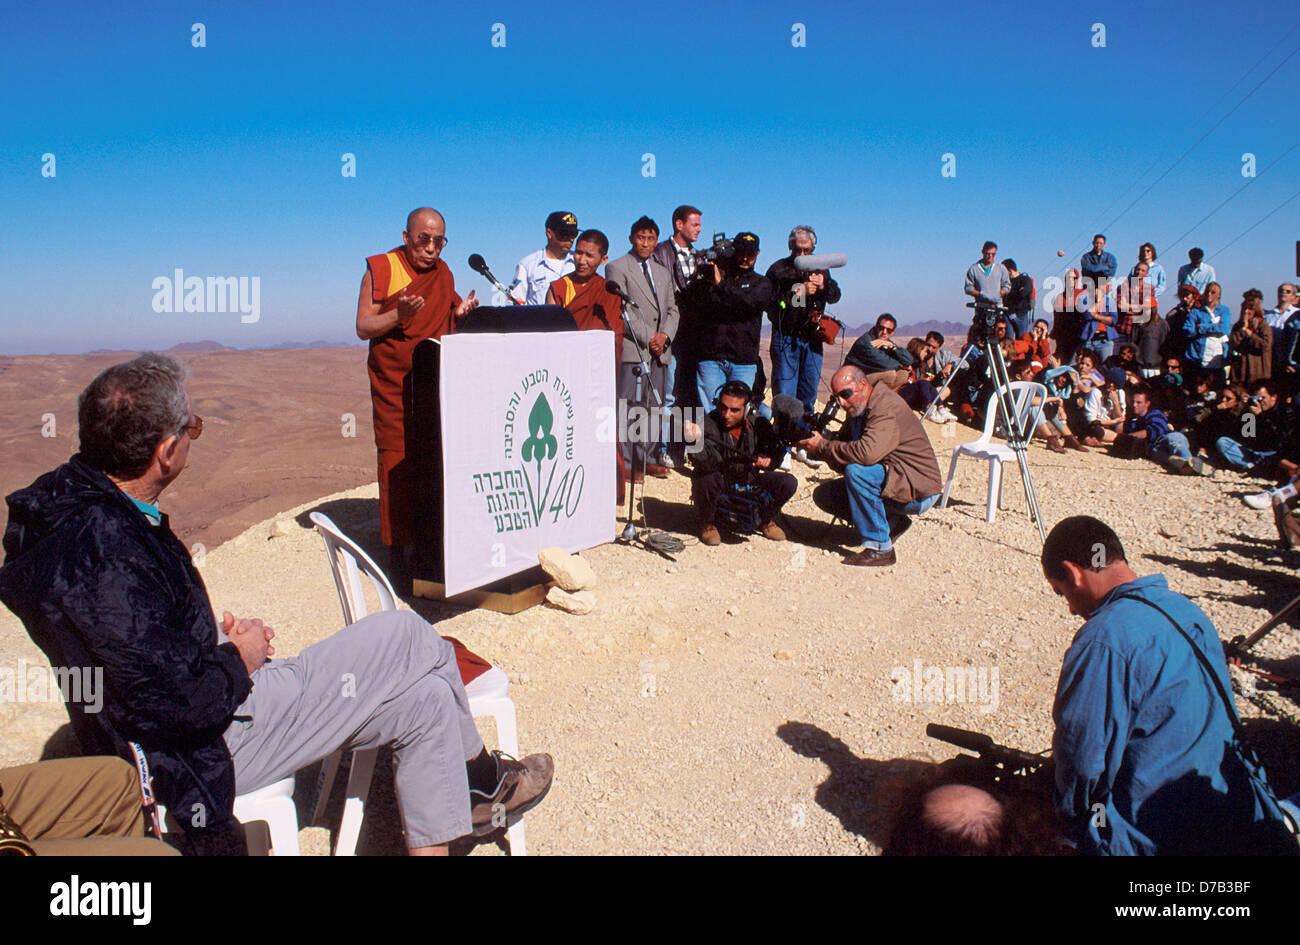 the dalai lama addressing a crowd in the arava - Stock Image